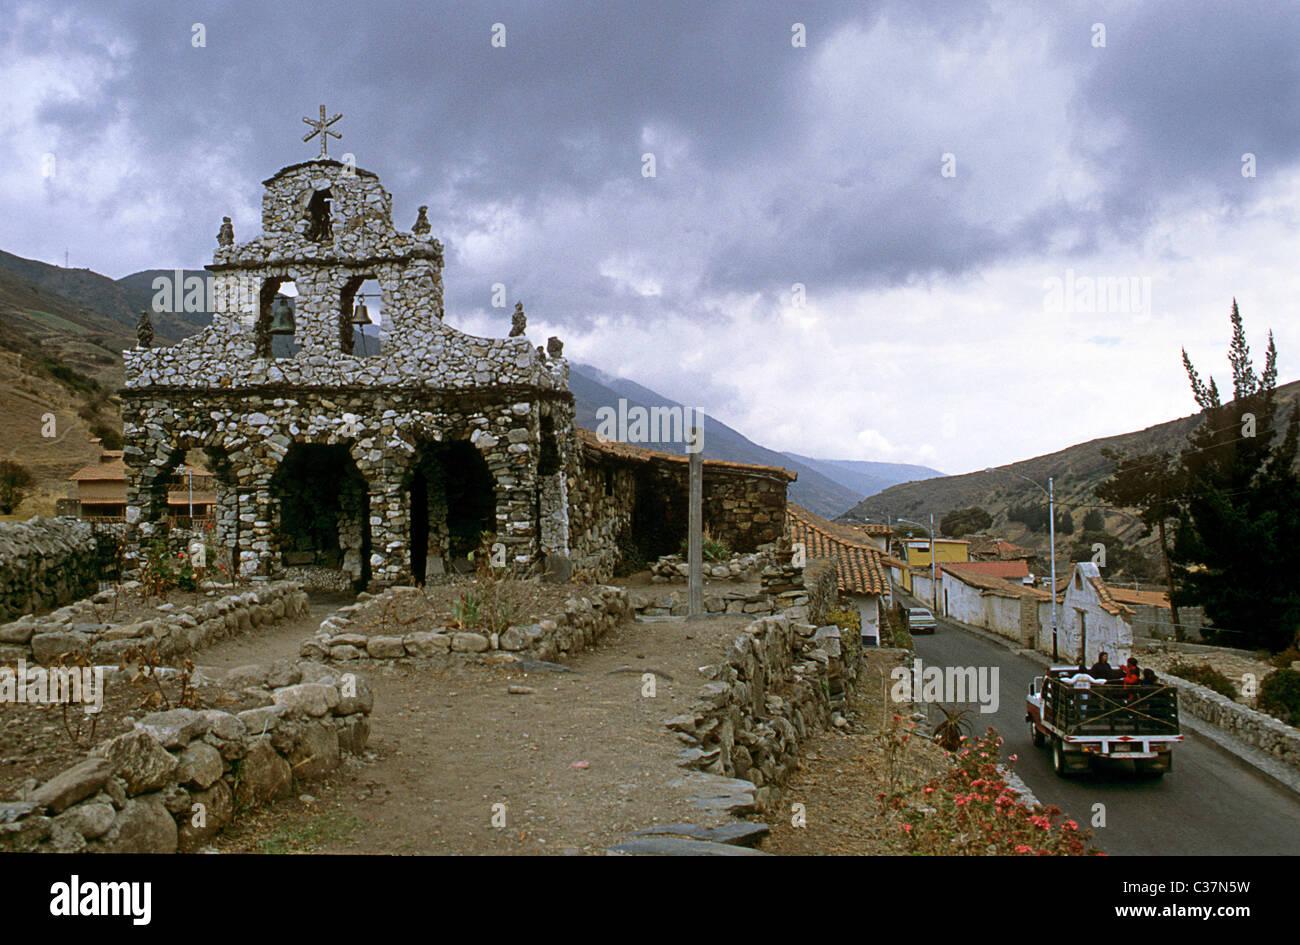 Stone chapel, capilla de piedra, Mucuchies, Venezuela - Stock Image